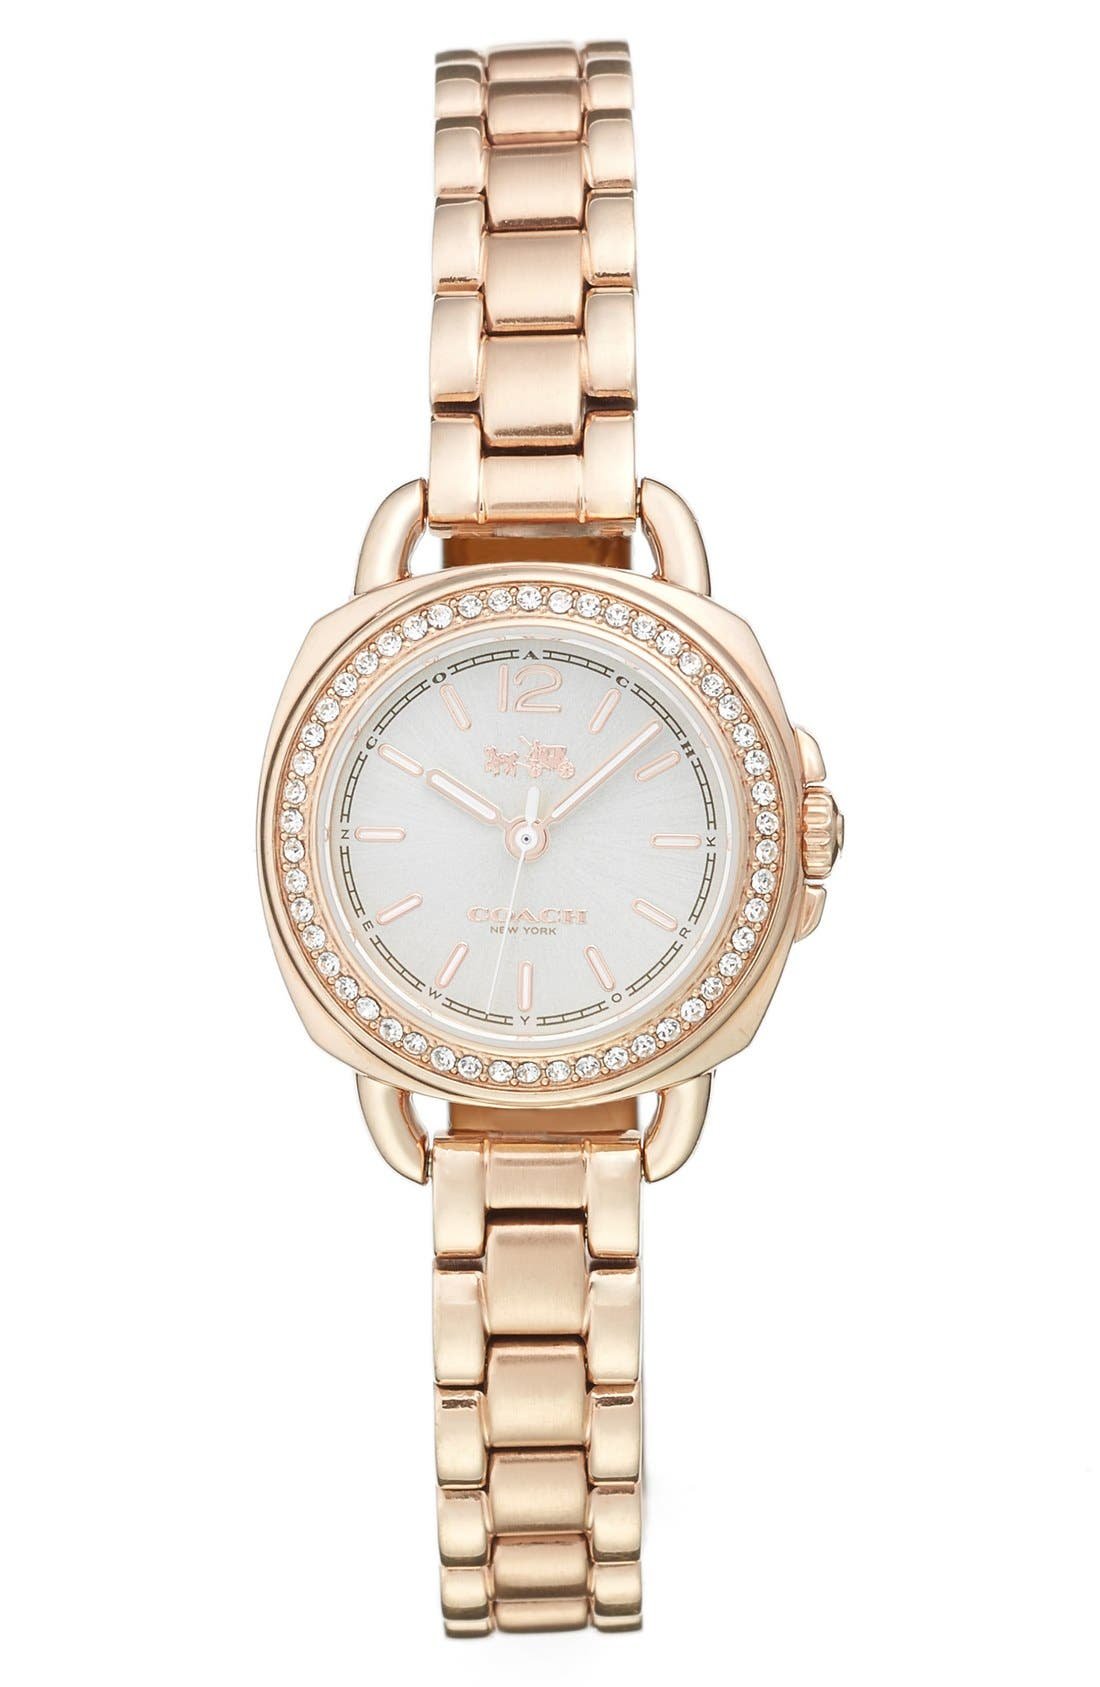 Coach 'Tatum' Crystal Bezel Bracelet Watch, 24mm